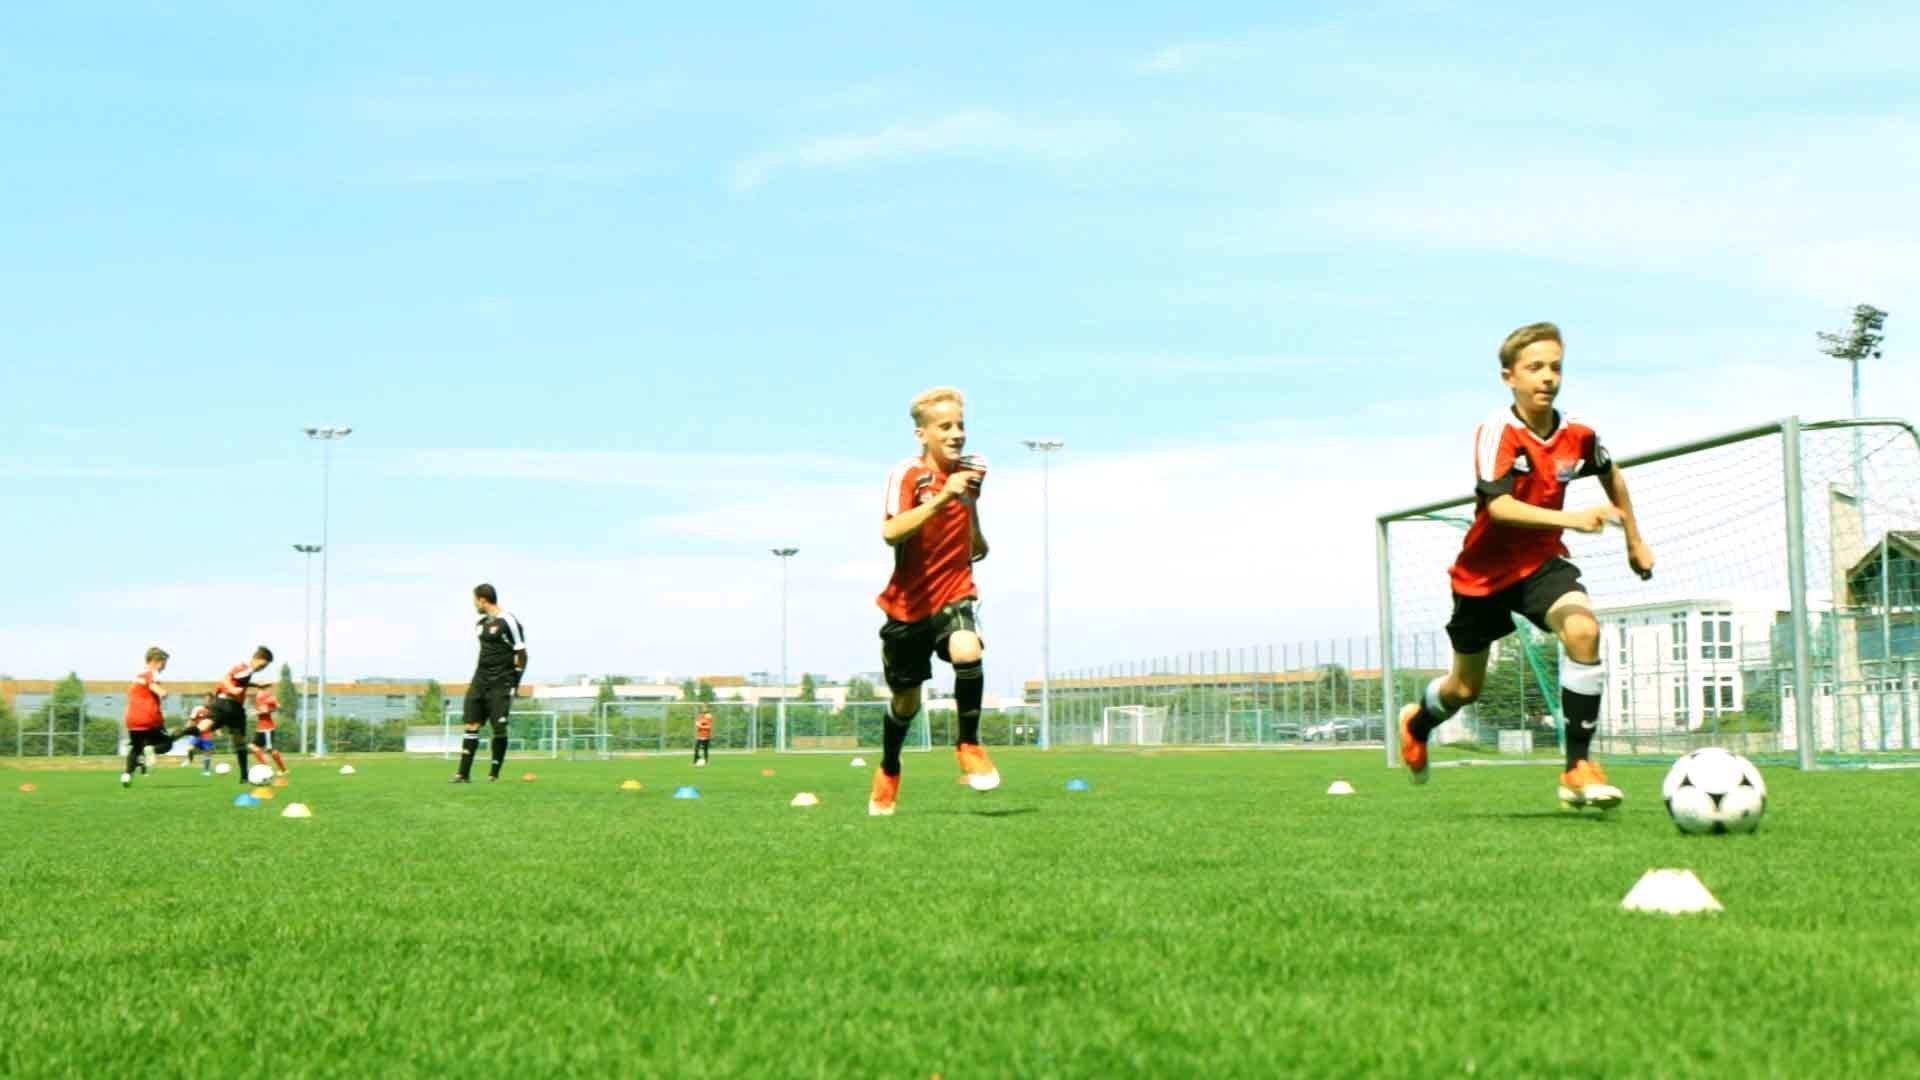 Reaktion & Technik im Jugendfußball: Fangspiel mit Ball